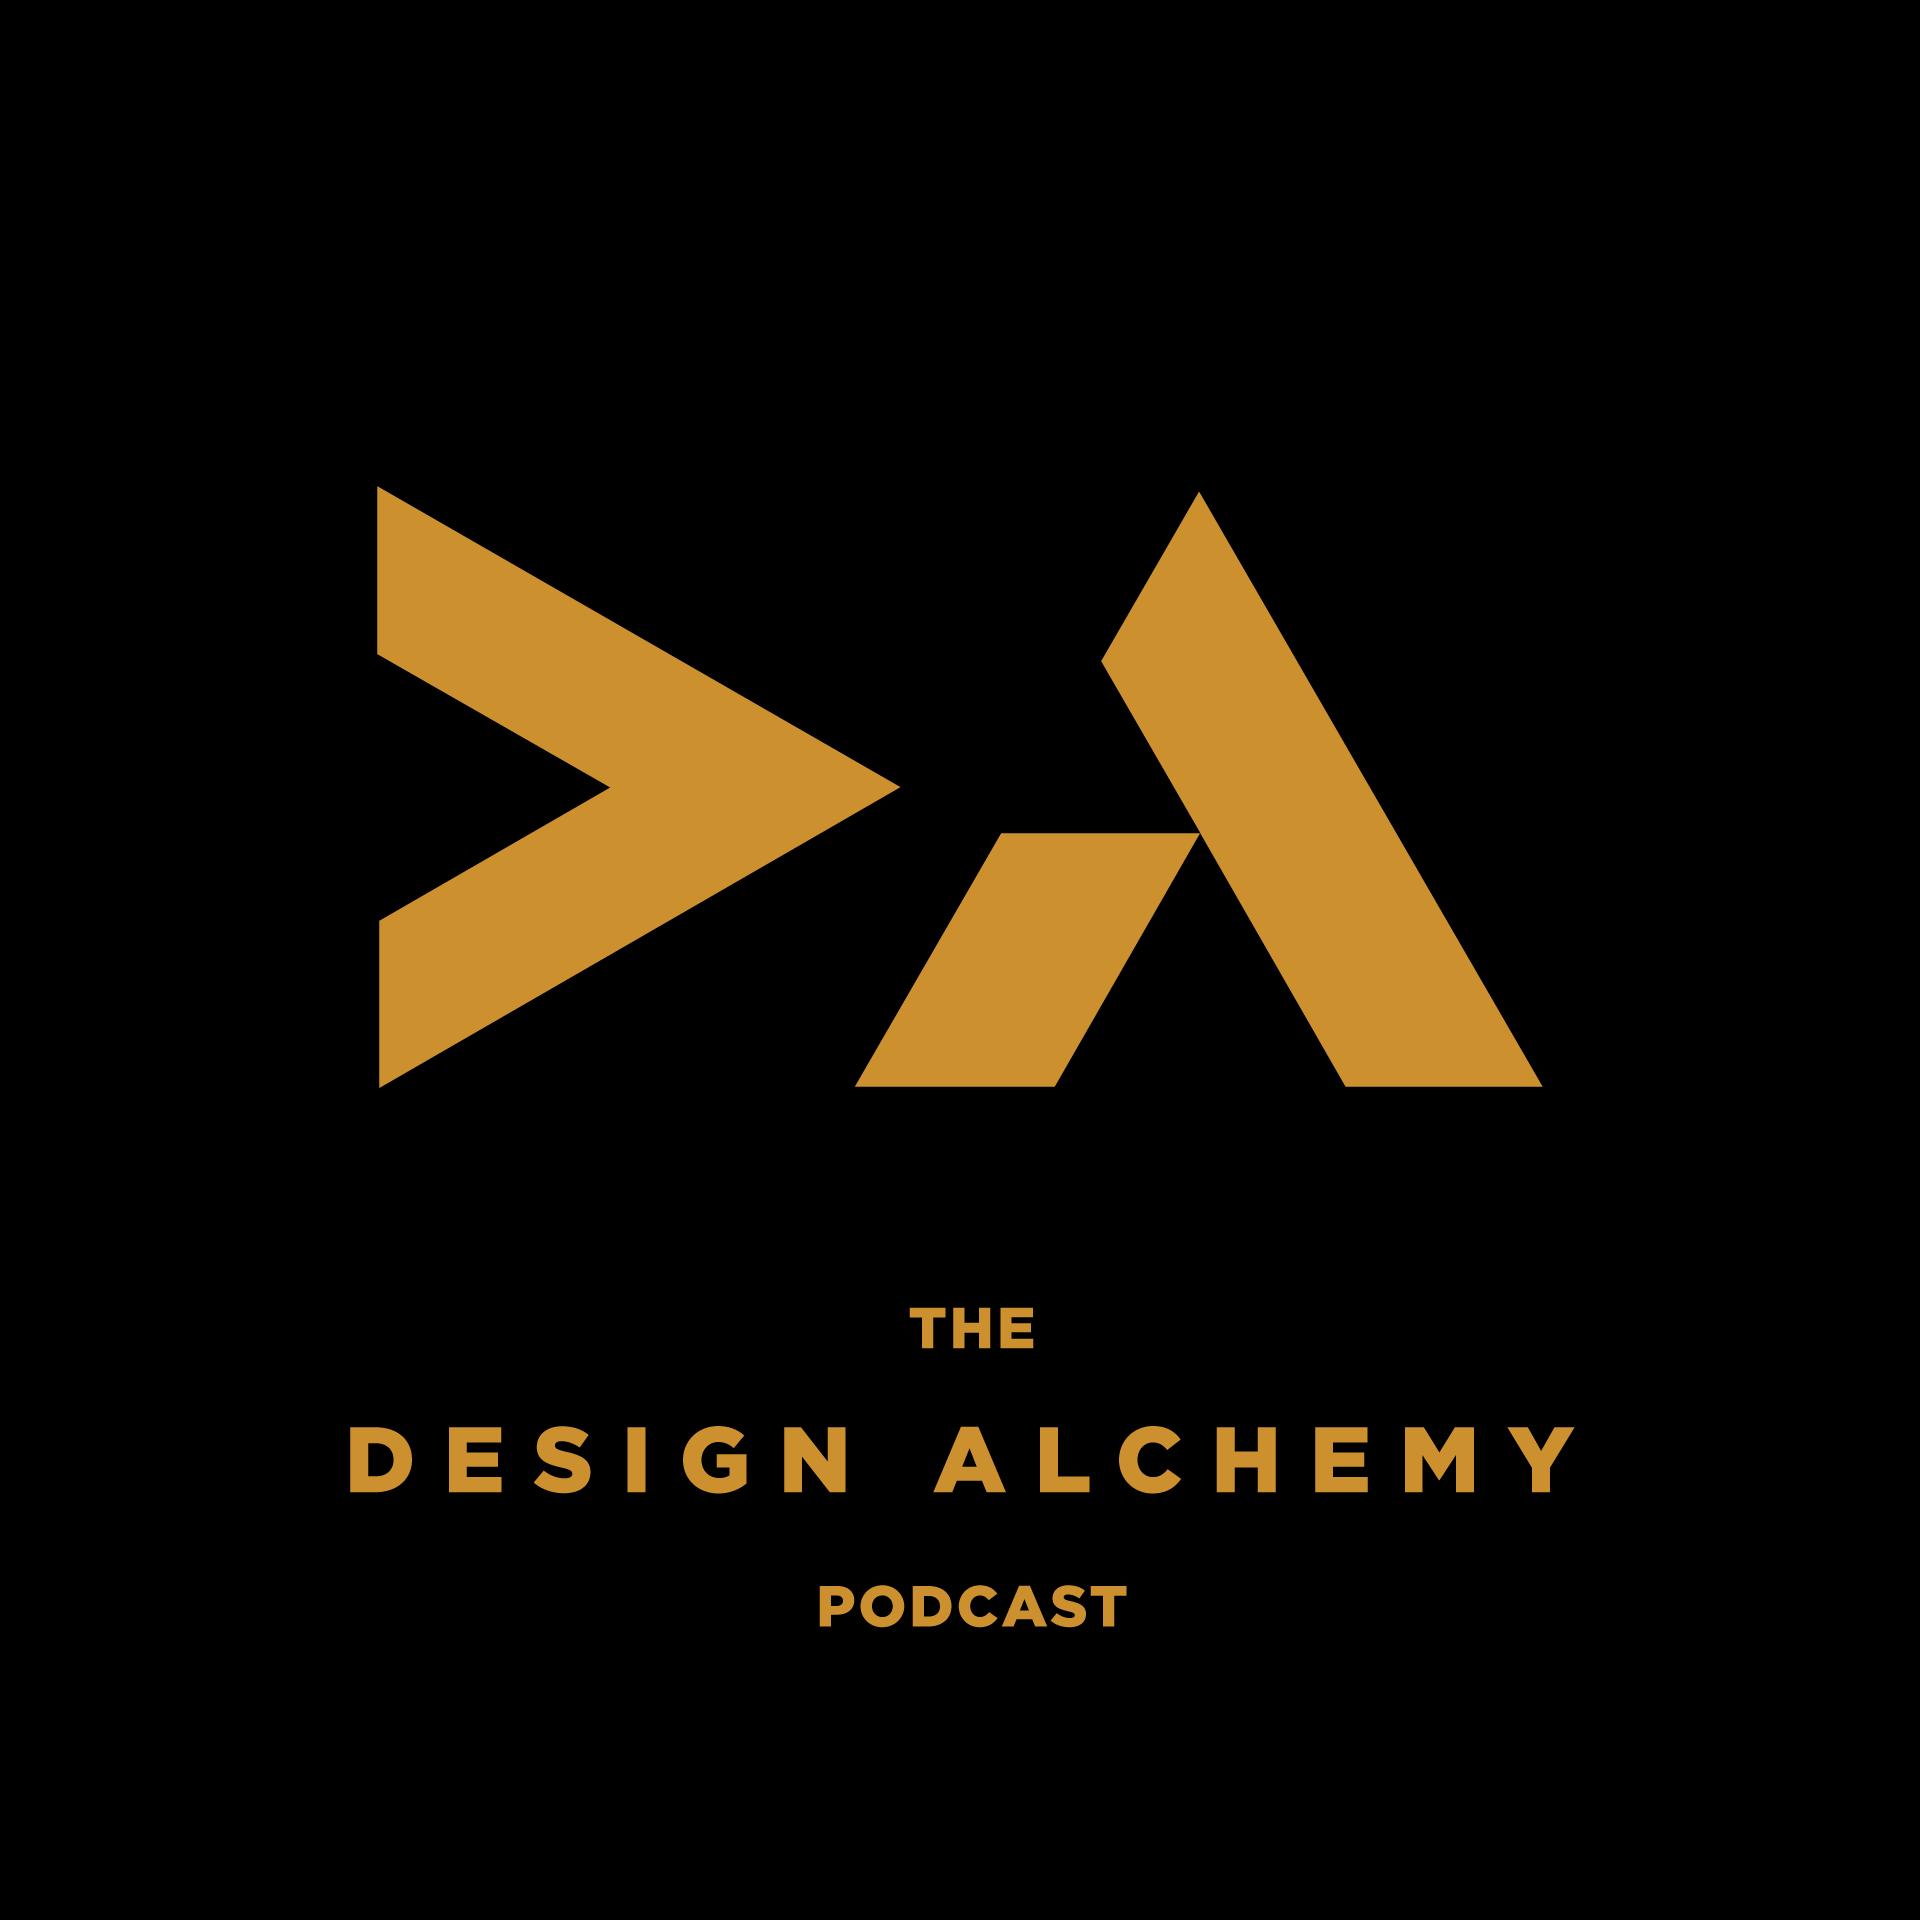 Design Alchemy